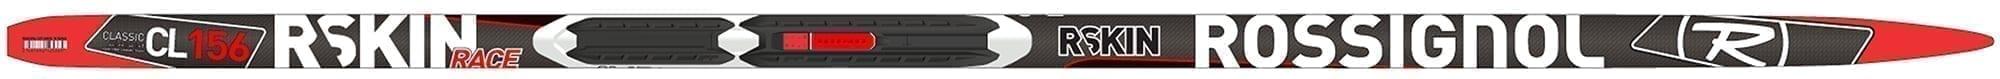 Rossignol X-ium classic WCS JR R-SKIN smørefrie ski